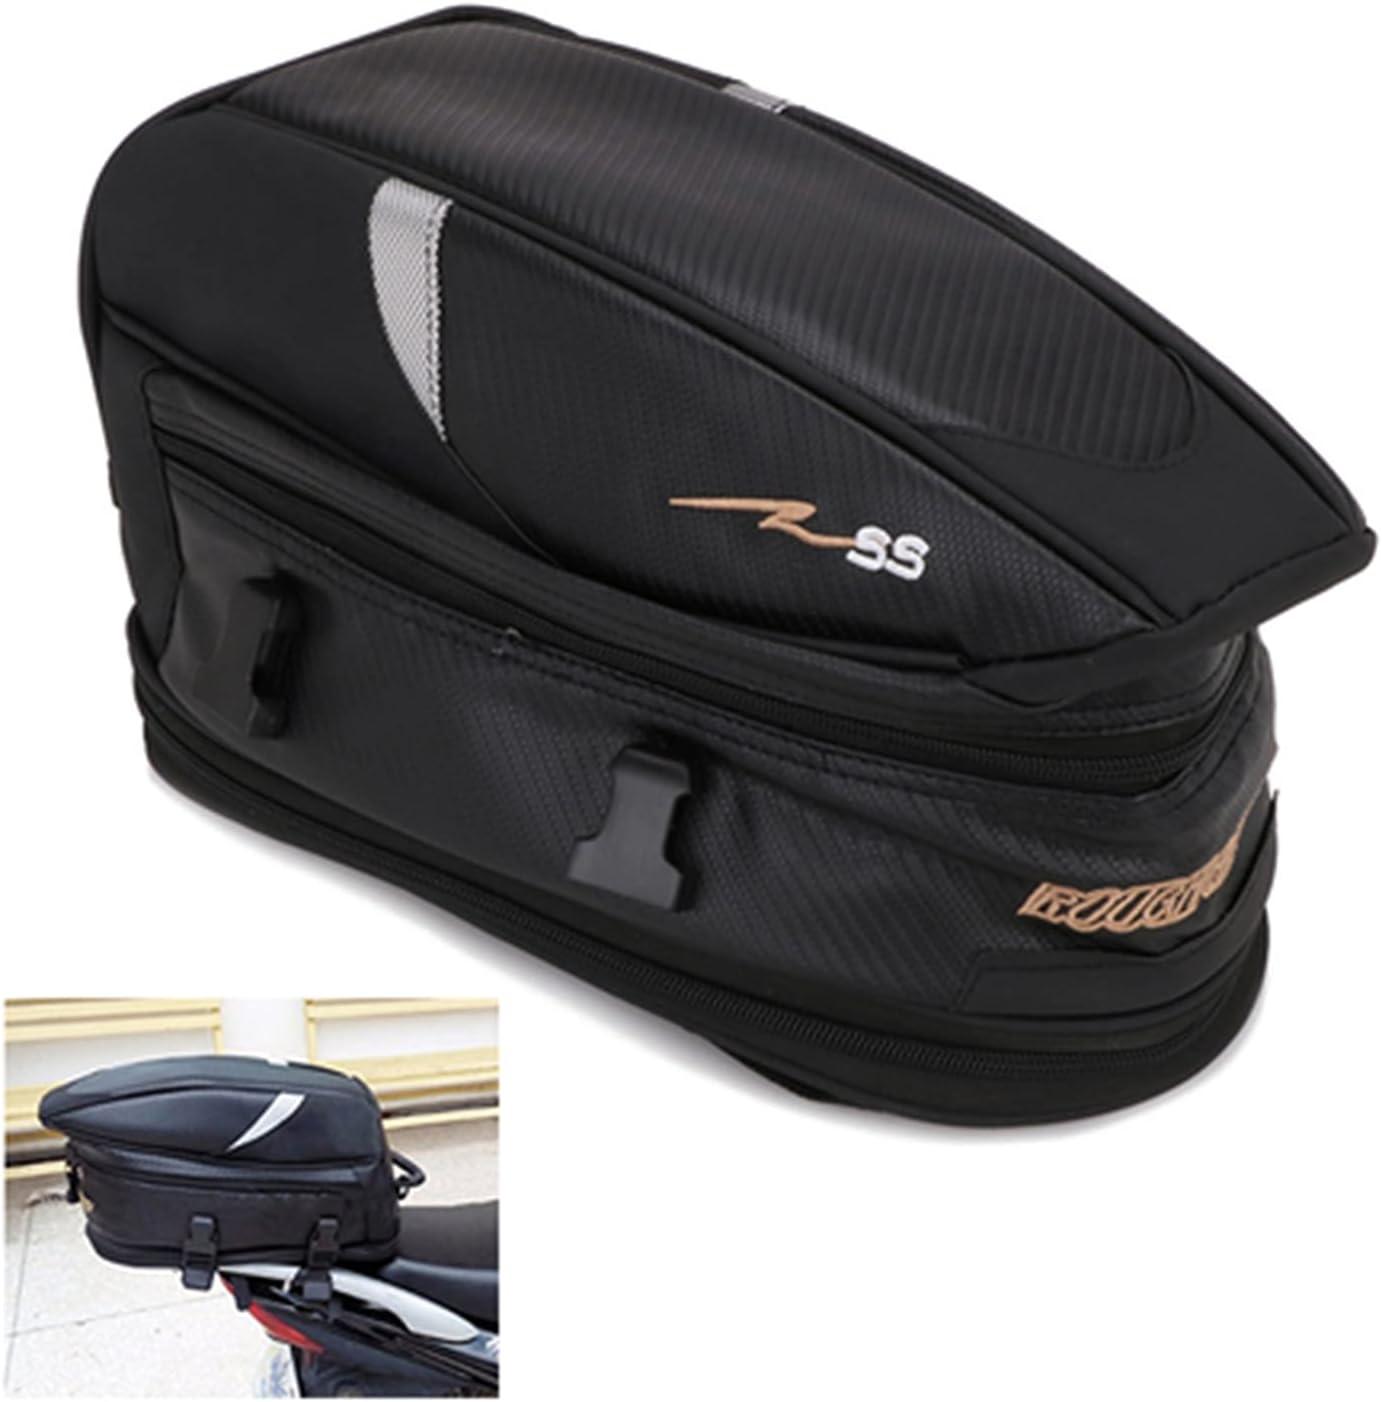 Bolsa de cola de motocicleta, bolsa de asiento de moto impermeable bolsa de sillín multifuncional Oxford Bike Dirt Bag Sport Backpack